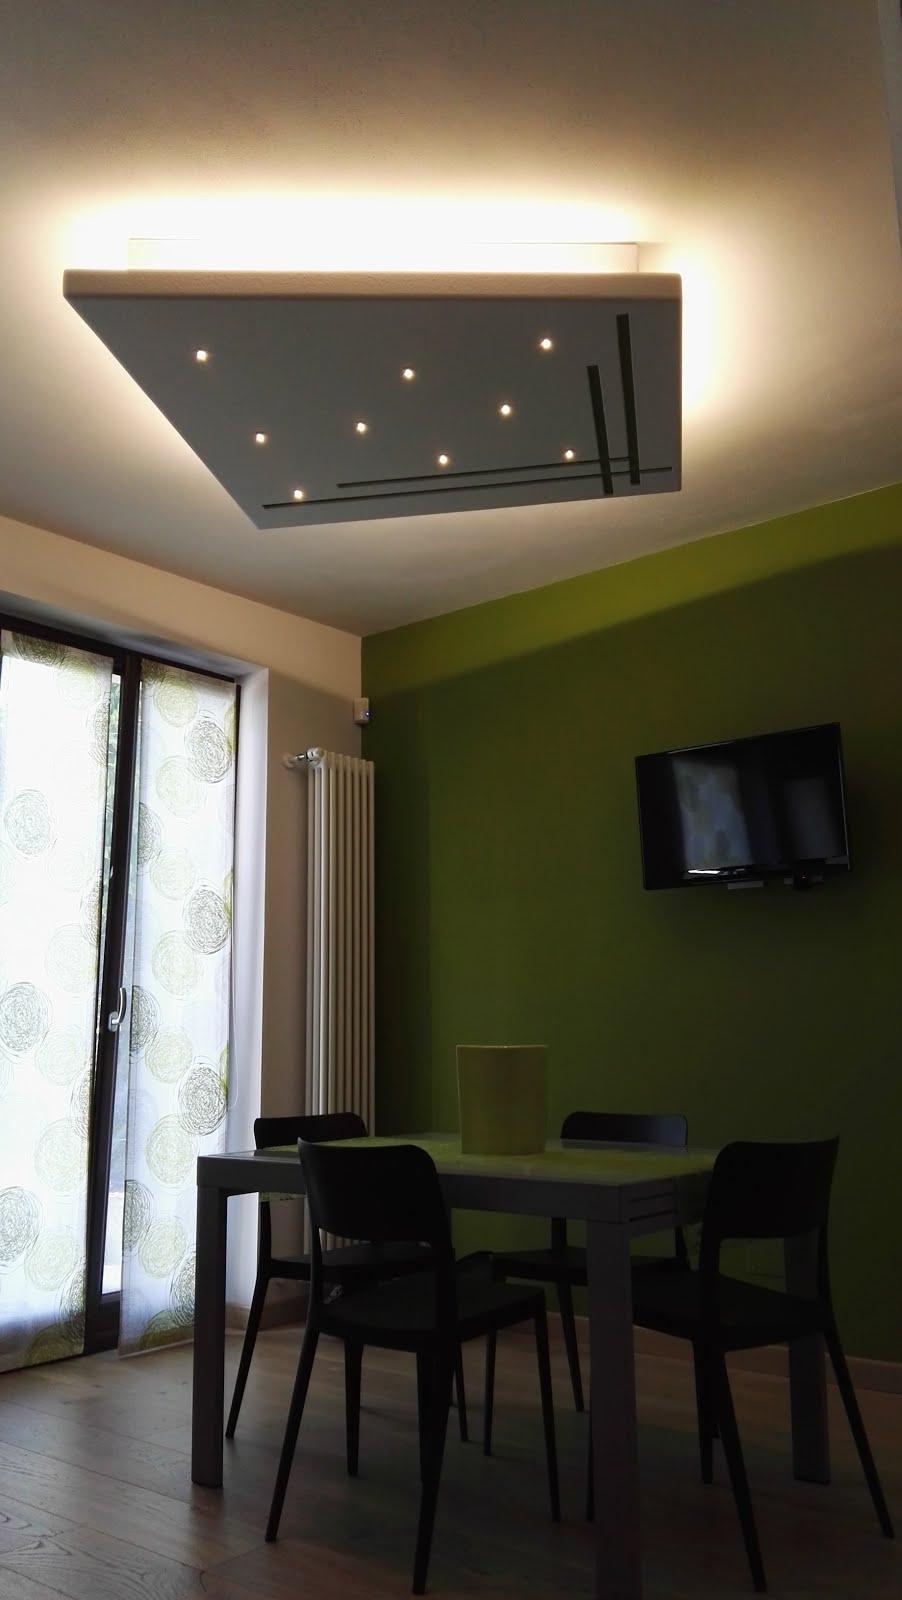 Illuminazione led casa lampadari a led di design forme di luce - Illuminazione led casa ...